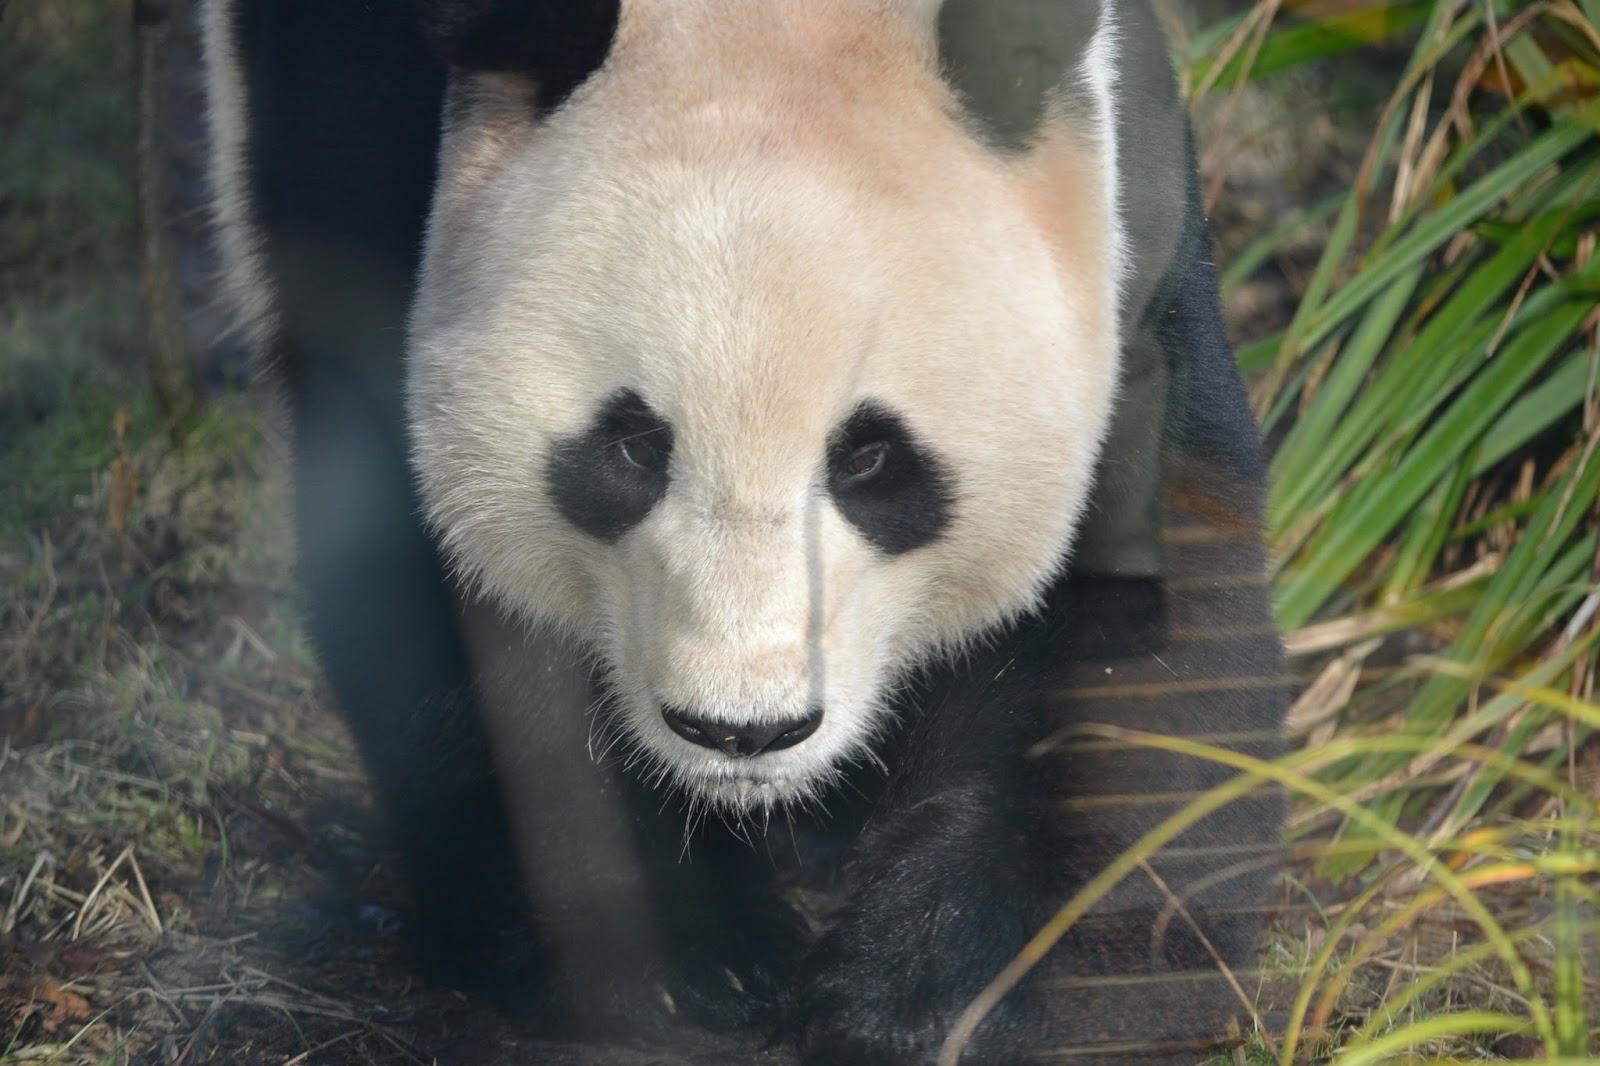 edinburgh zoo pandas